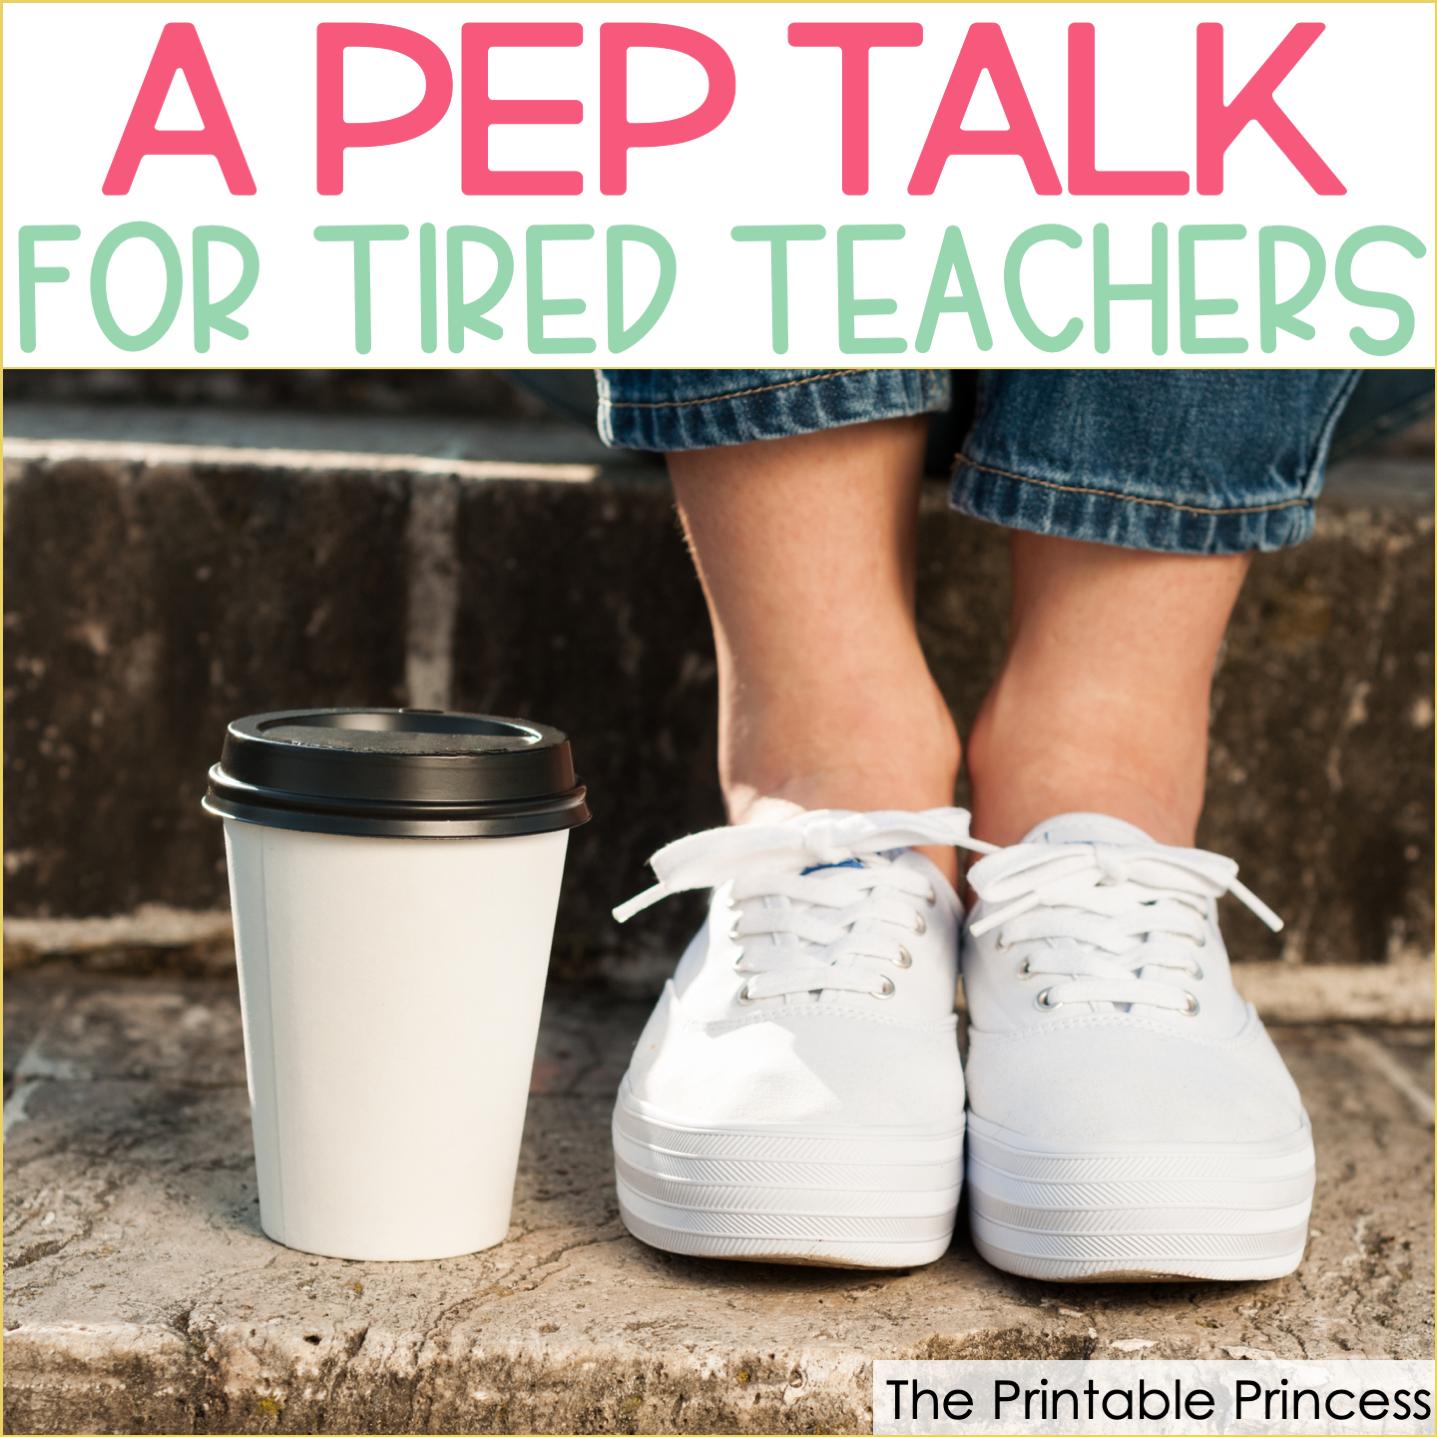 Pep Talk for Tired Teachers